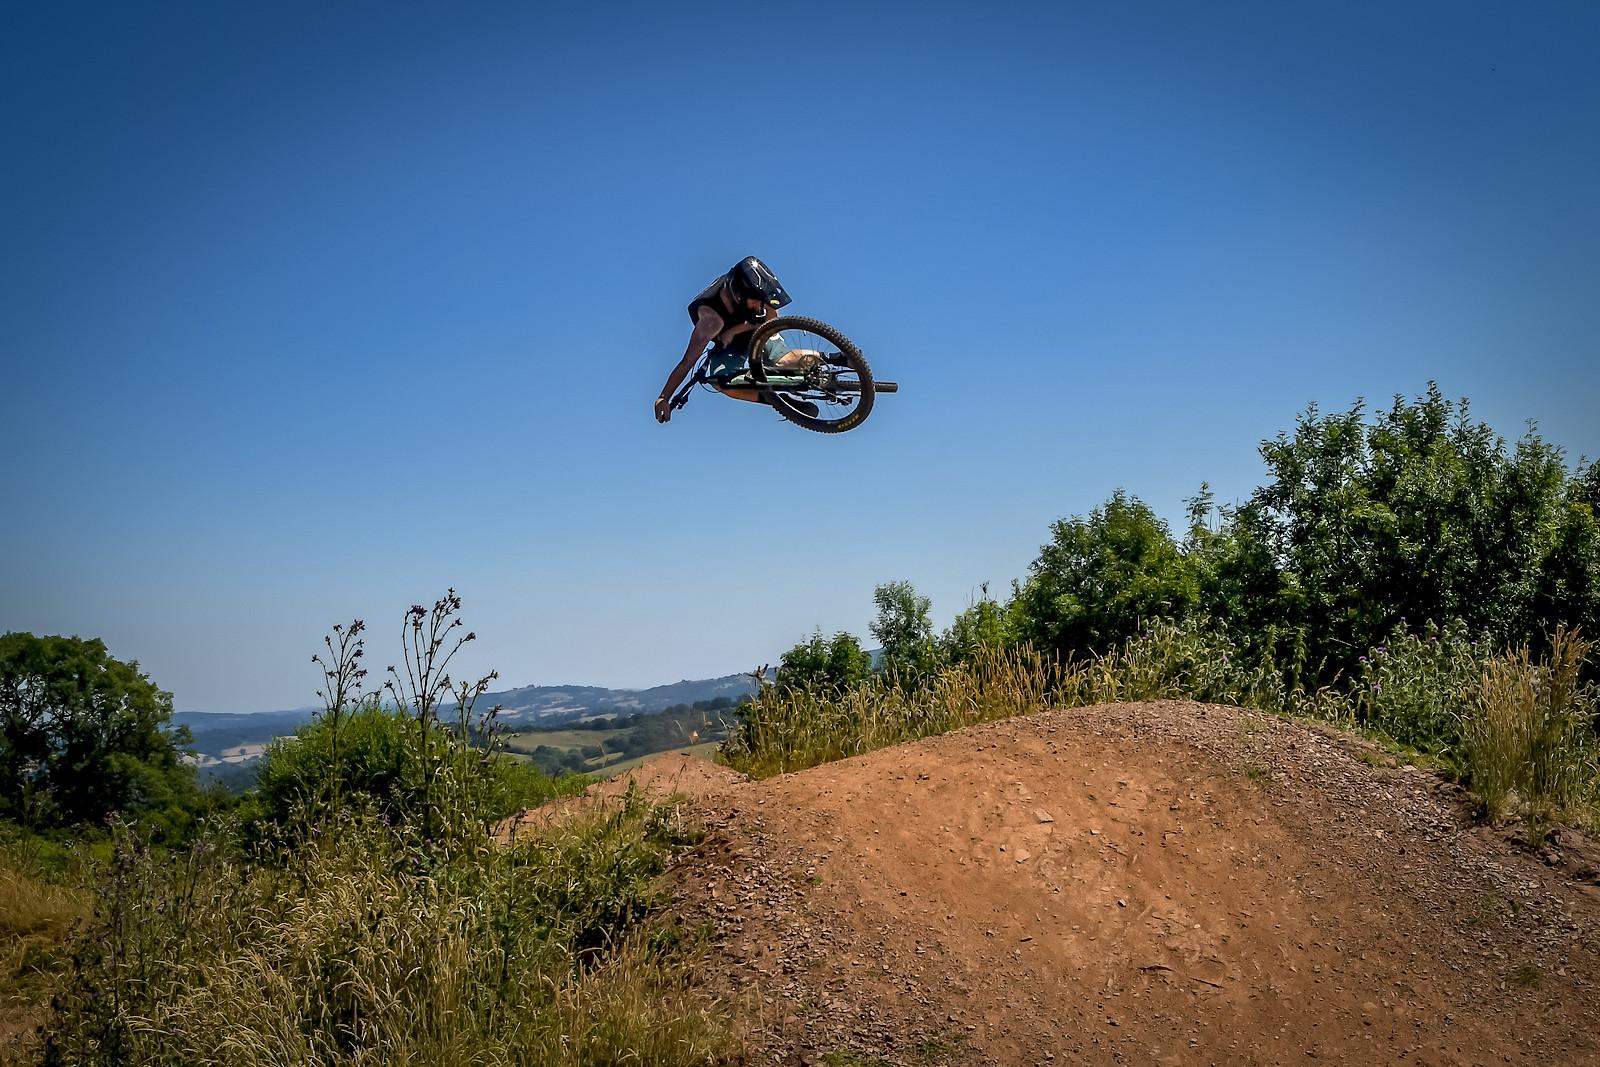 ROB1695 - robbarkerimages2017 - Mountain Biking Pictures - Vital MTB